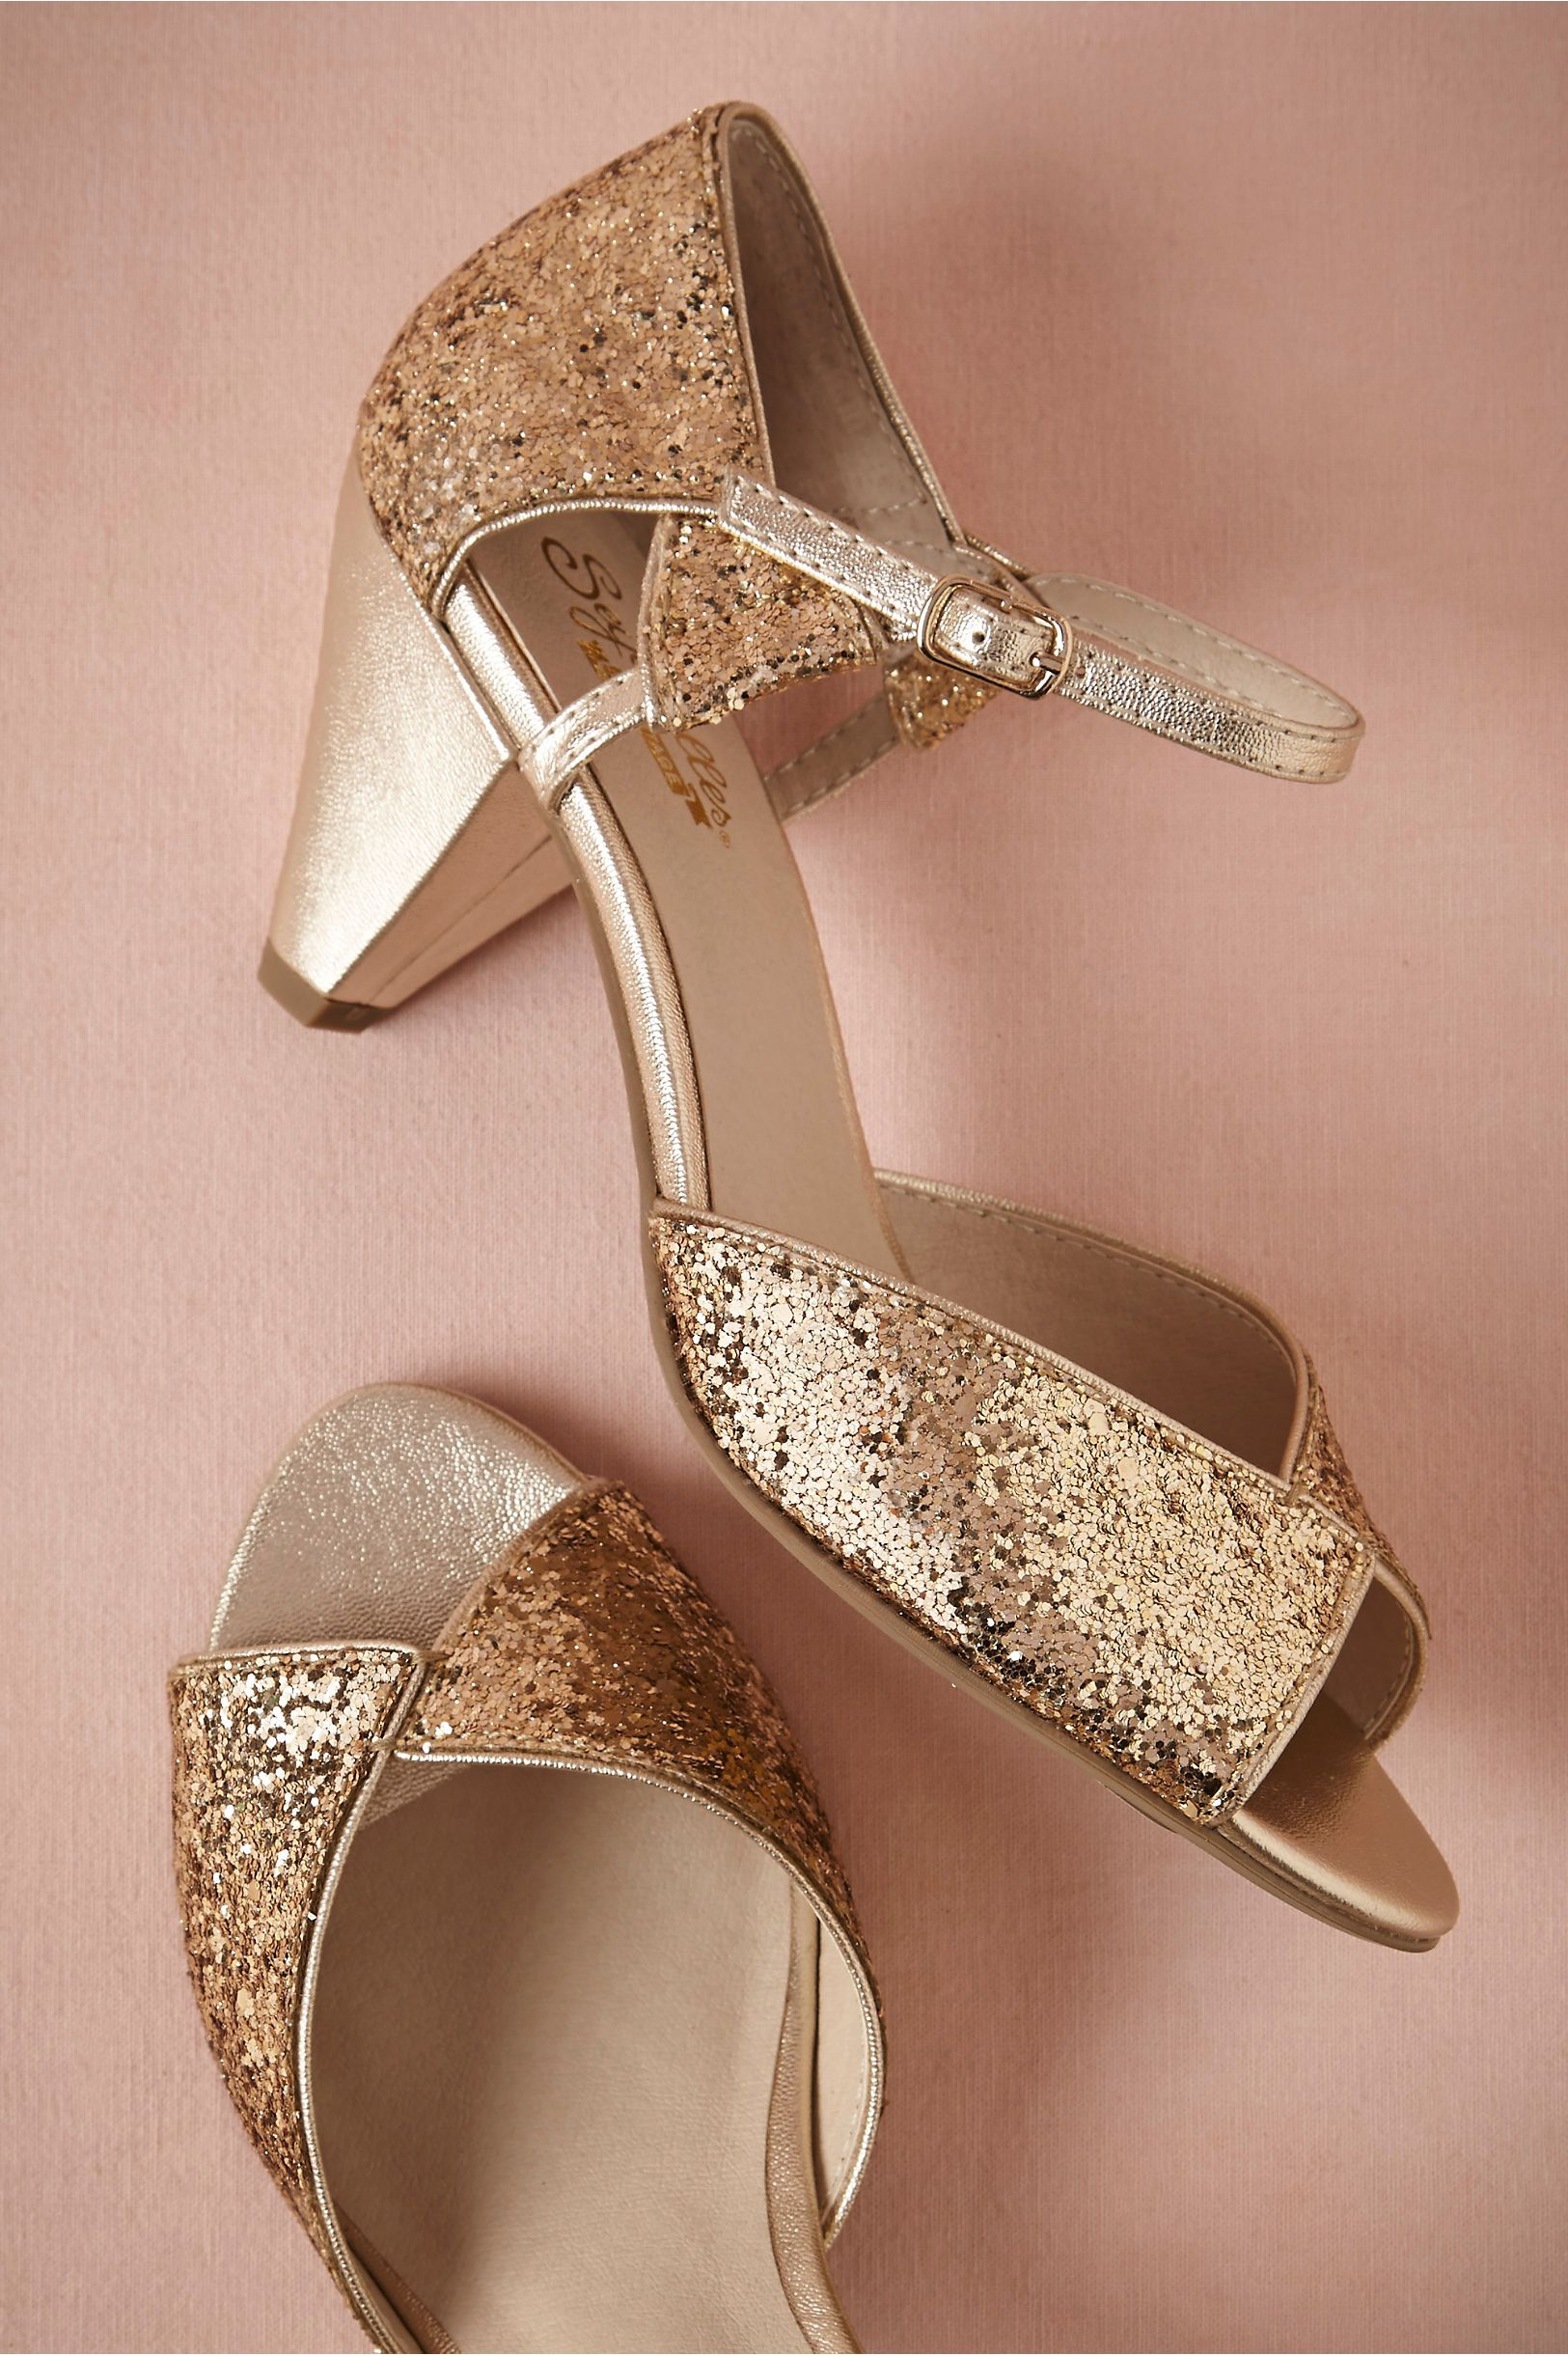 Glittering Gold Heels By Seychelles From BHLDN · Glitter Wedding ShoesSparkly  ...